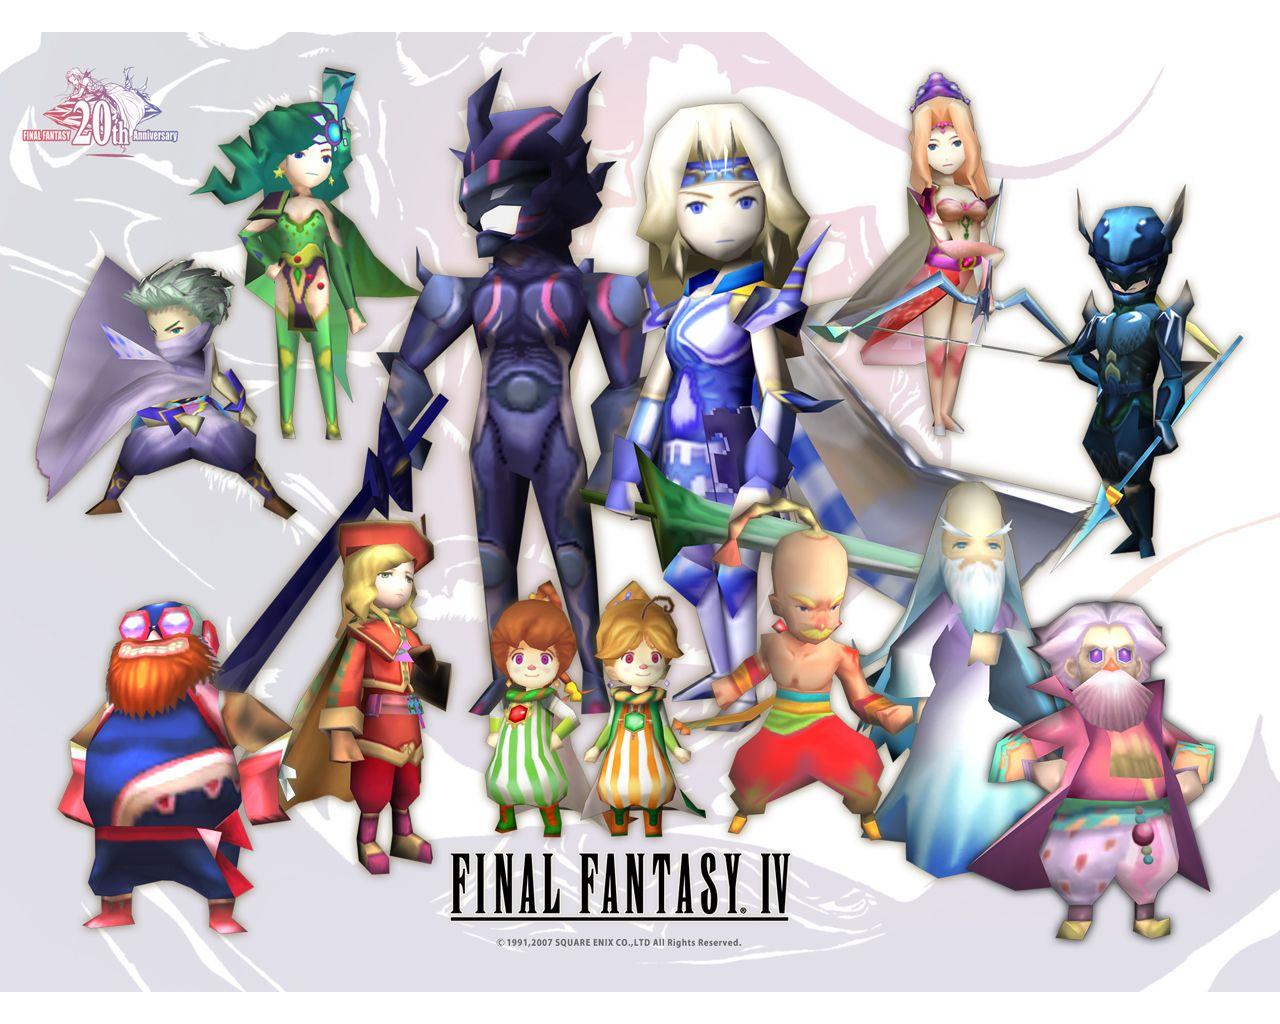 Fondos de pantalla Final Fantasy IV DS